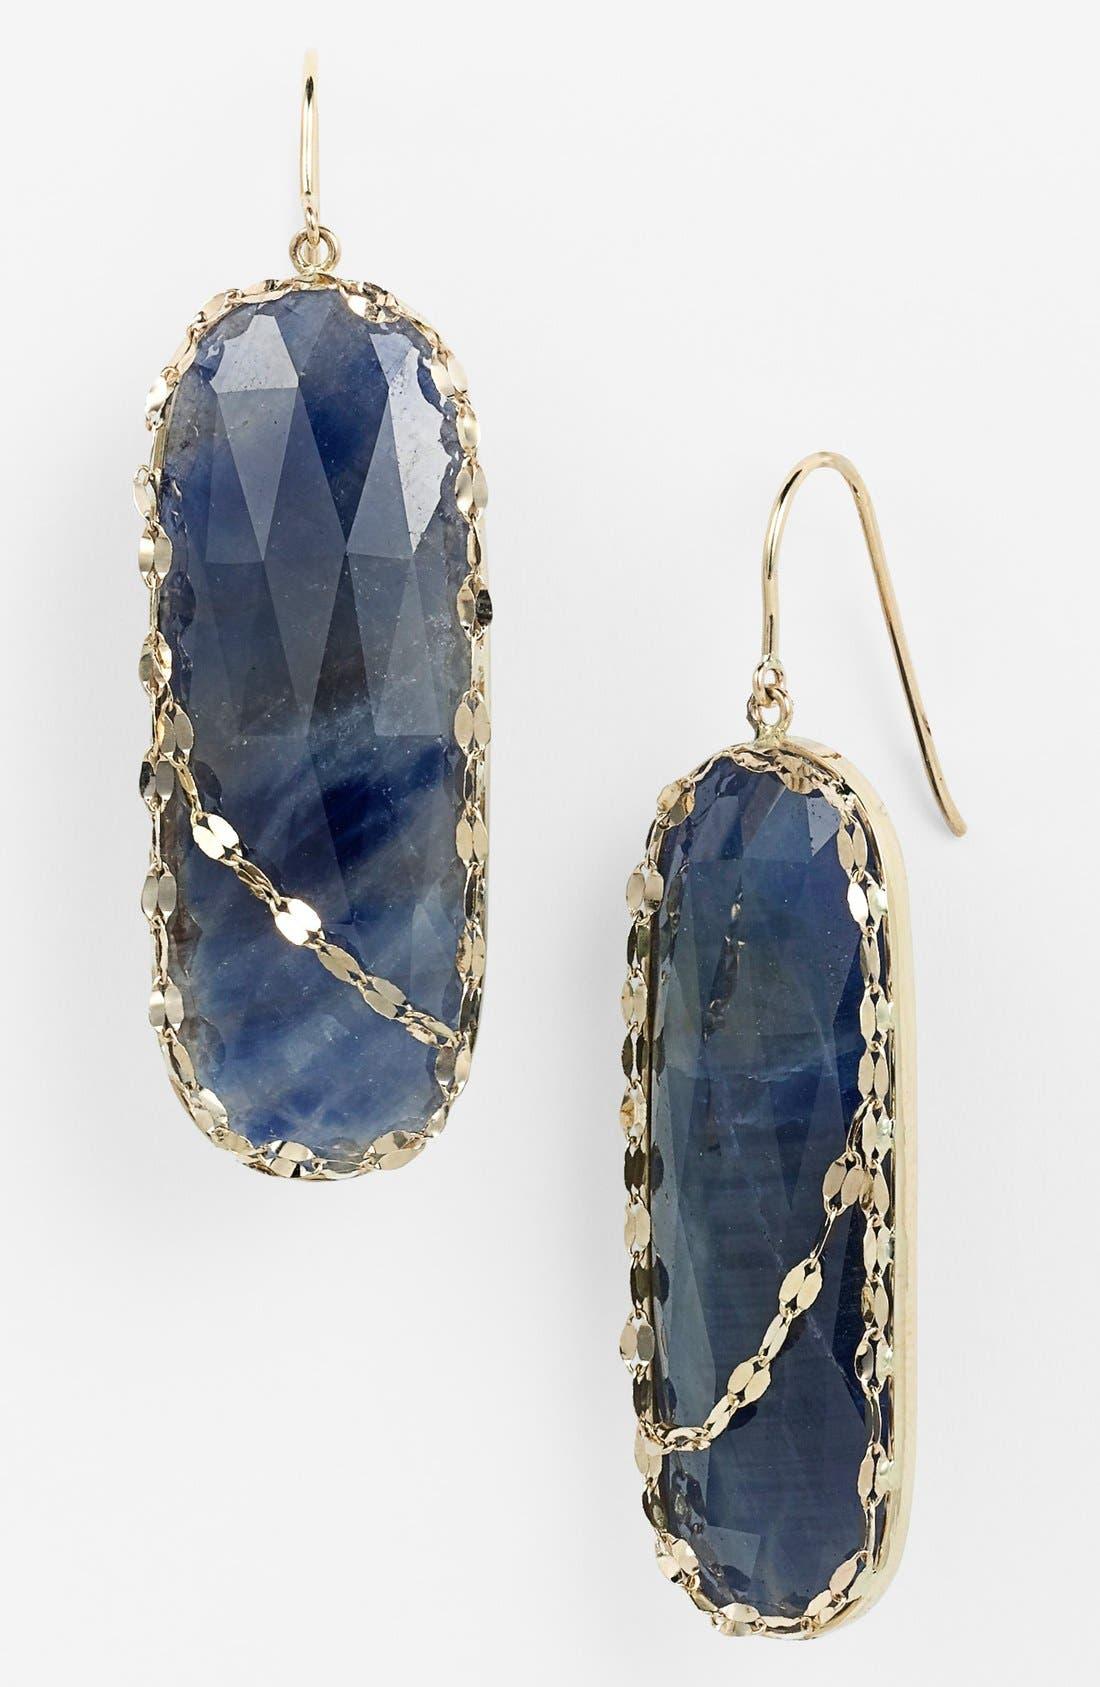 Alternate Image 1 Selected - Lana Jewelry 'Stone Gold' Sapphire Drop Earrings